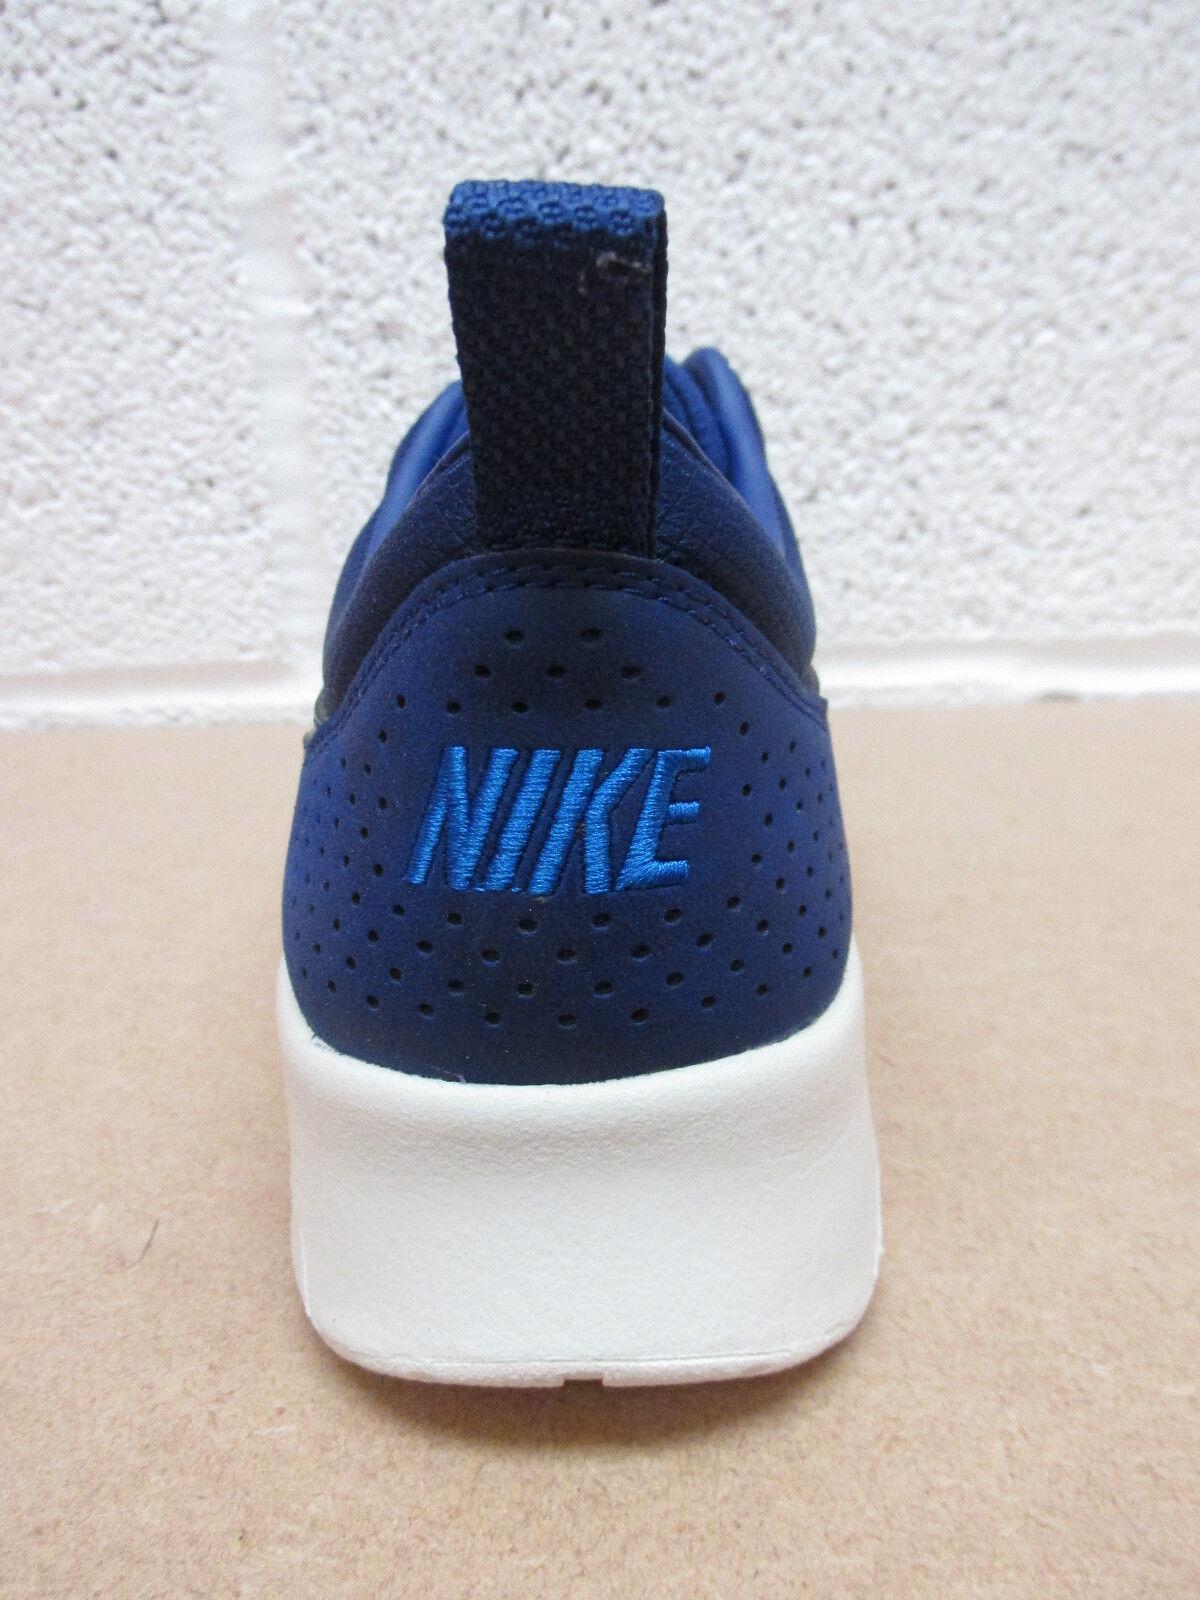 Nike Nike Nike Mujer Air Max Thea Prm Zapatillas Running 616723 400 Zapatillas cfe2f2